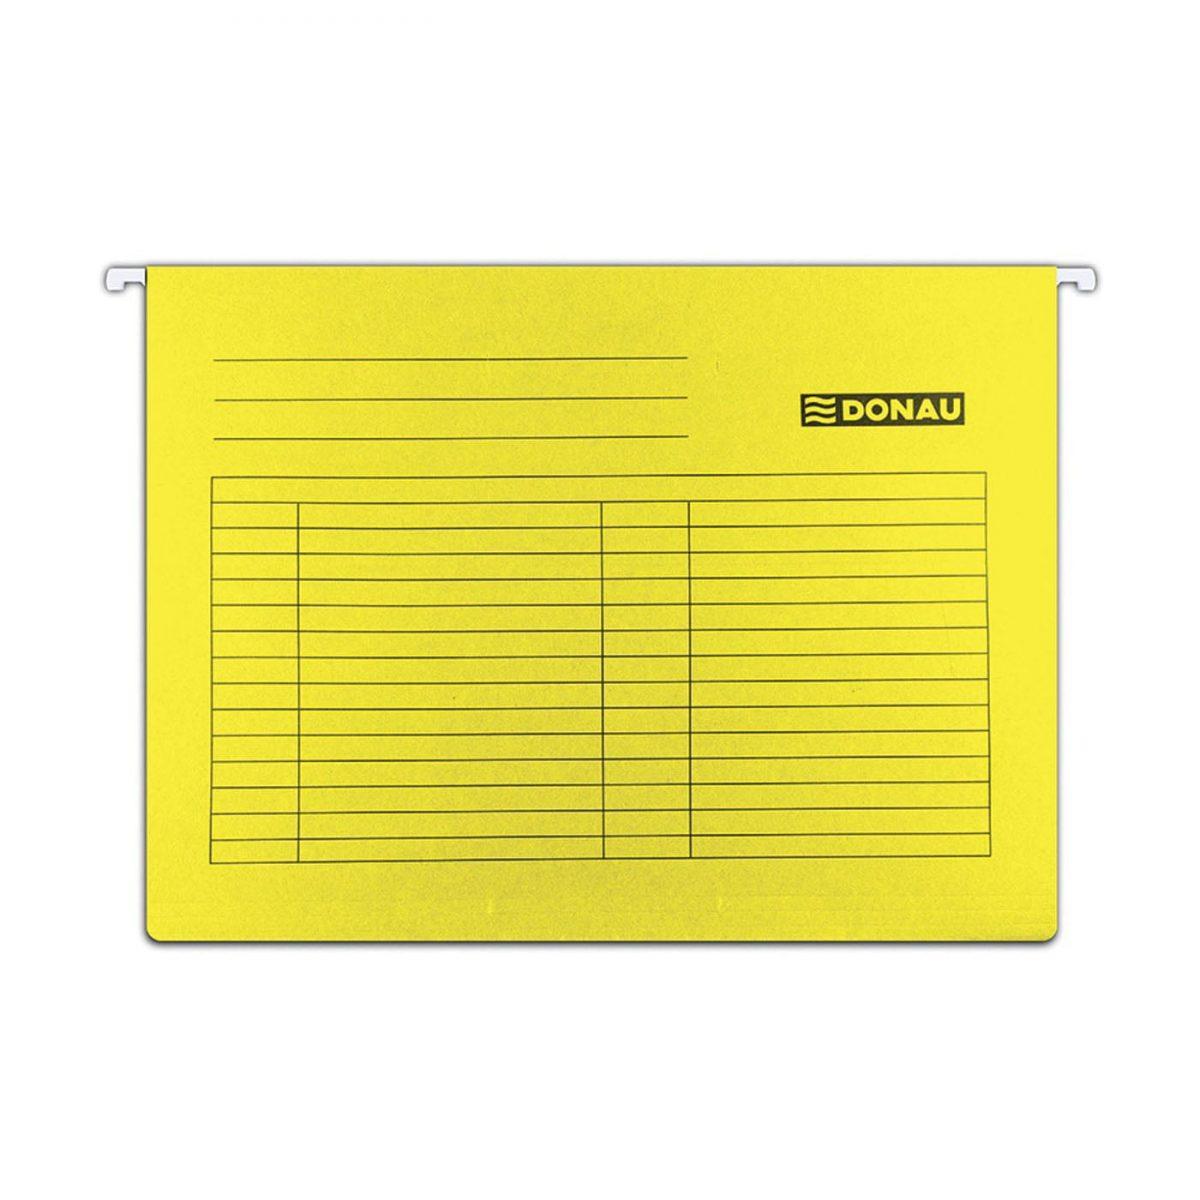 Dosar suspendabil cu eticheta, bagheta metalica, carton 230g/mp, 5 buc/set, DONAU - galben